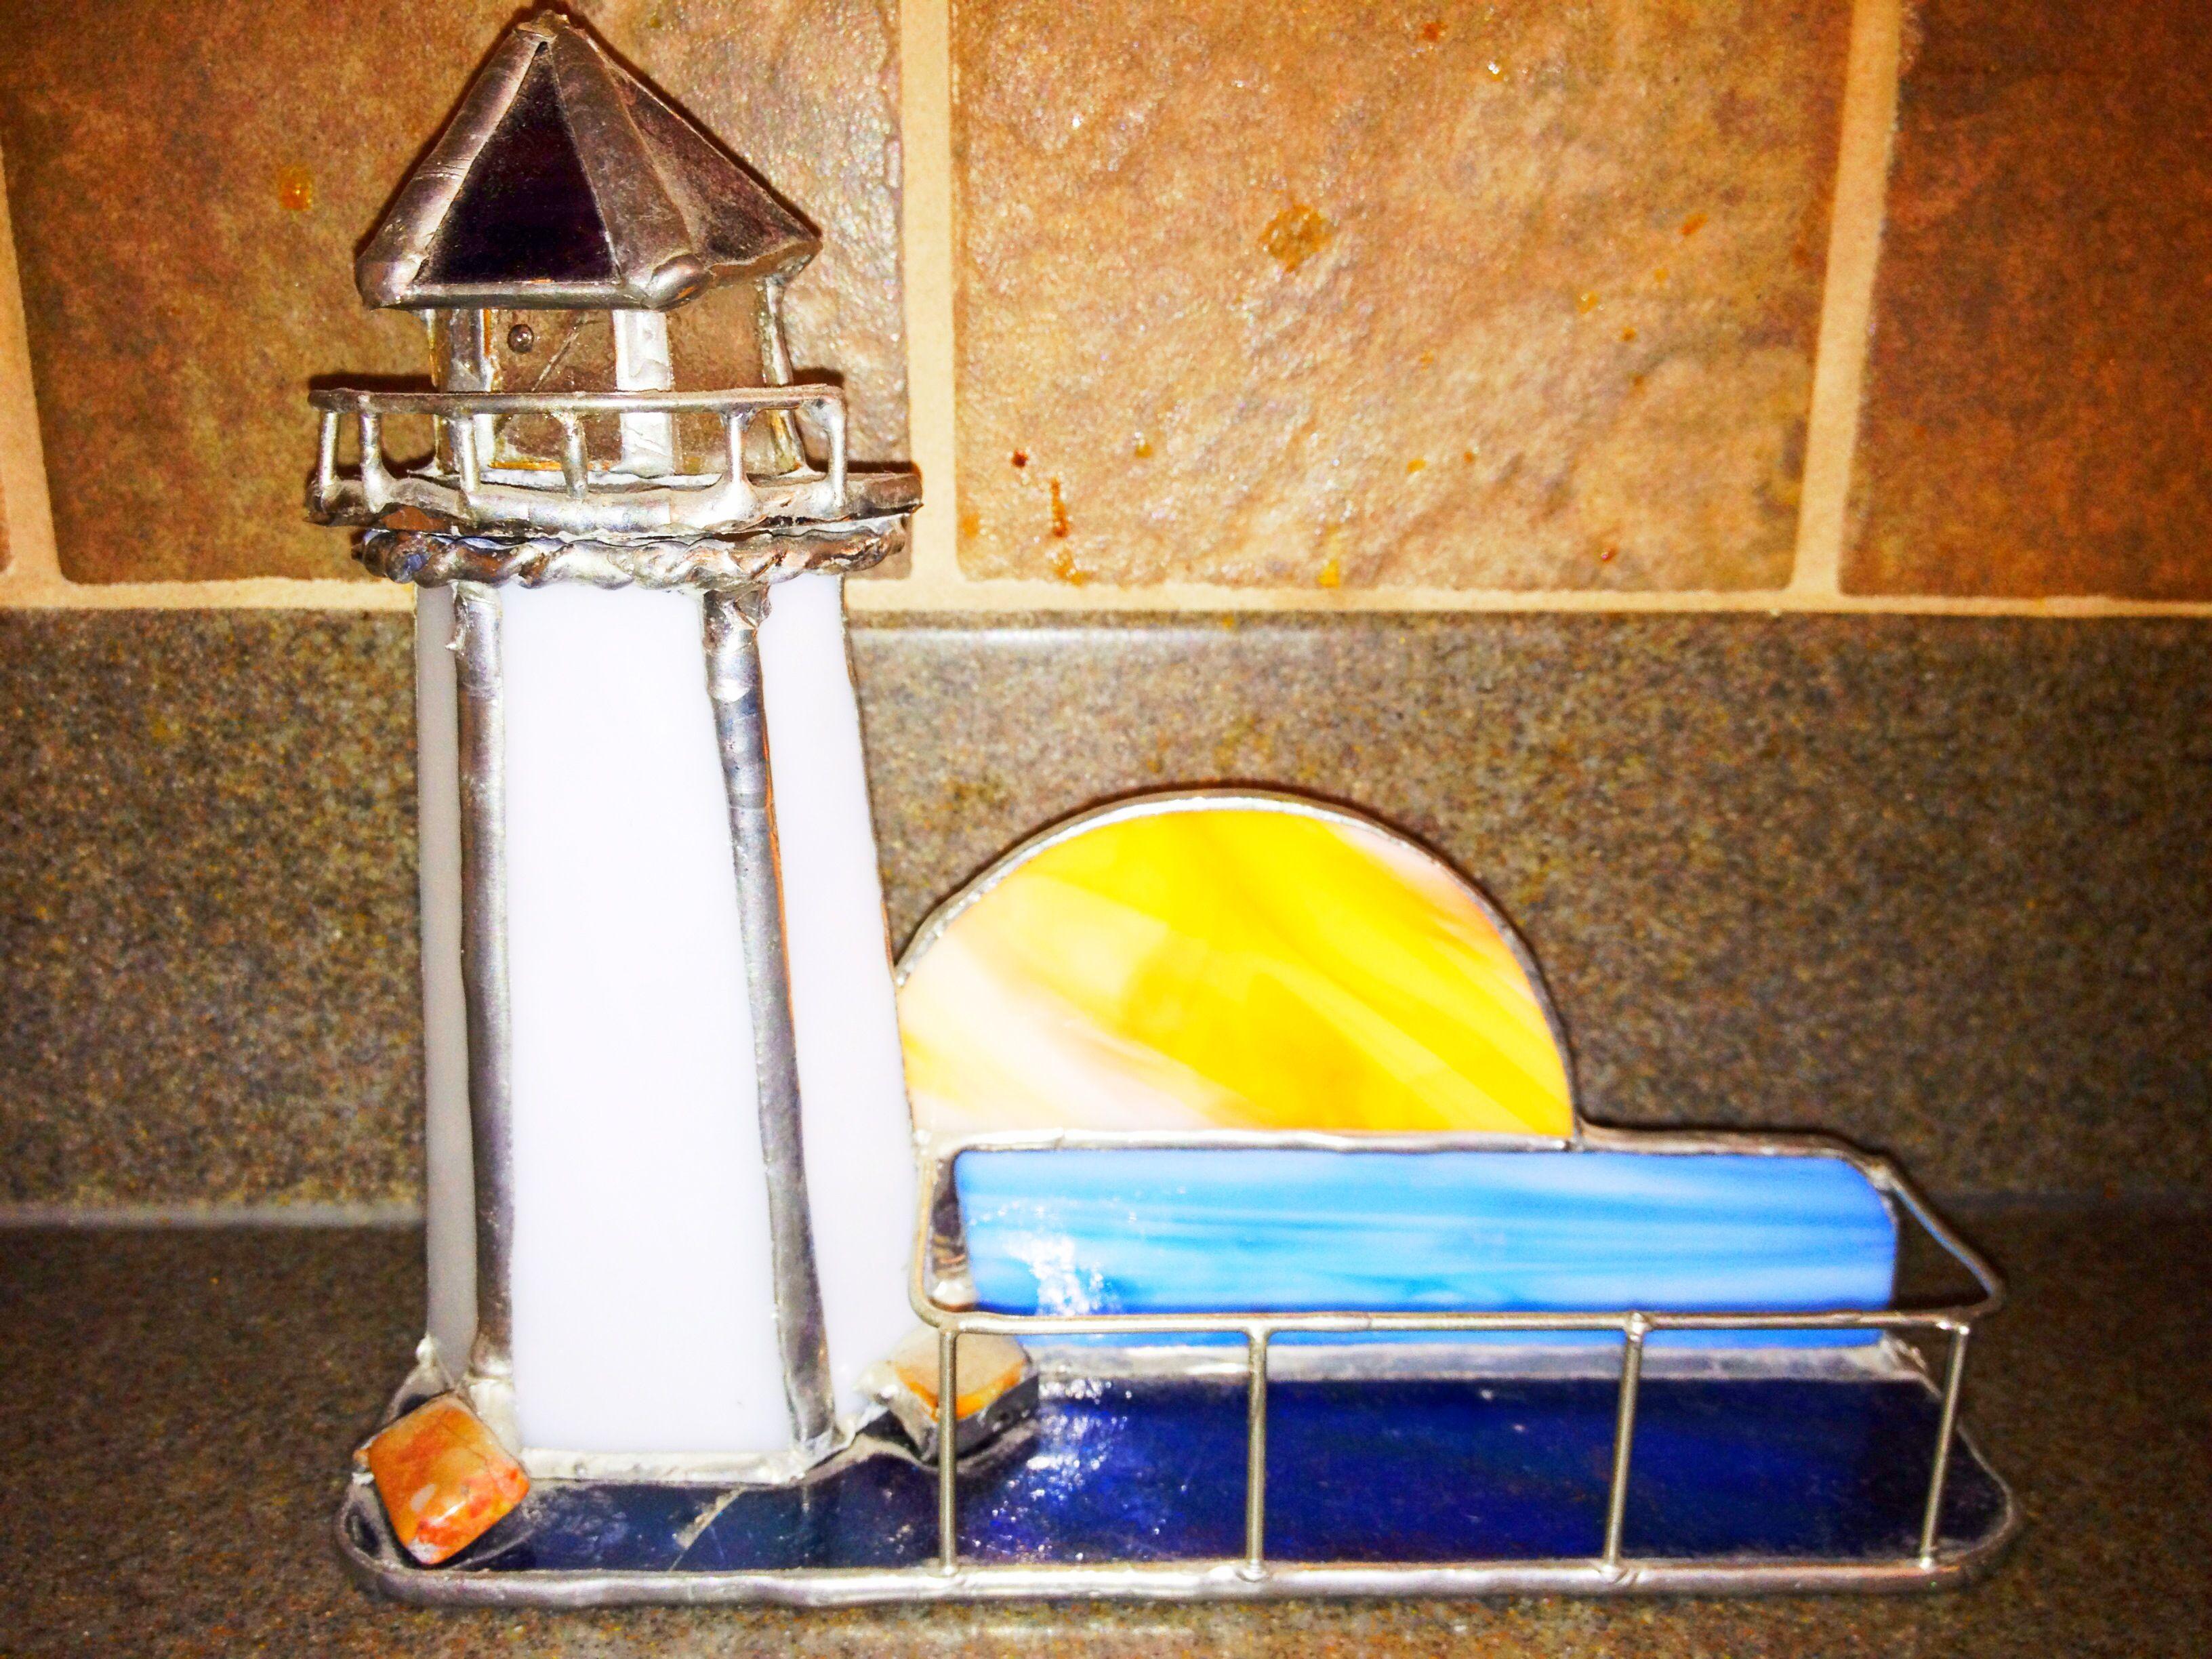 Lighthouse business card holder Stain Glass Art of Vivian Sarkis ...